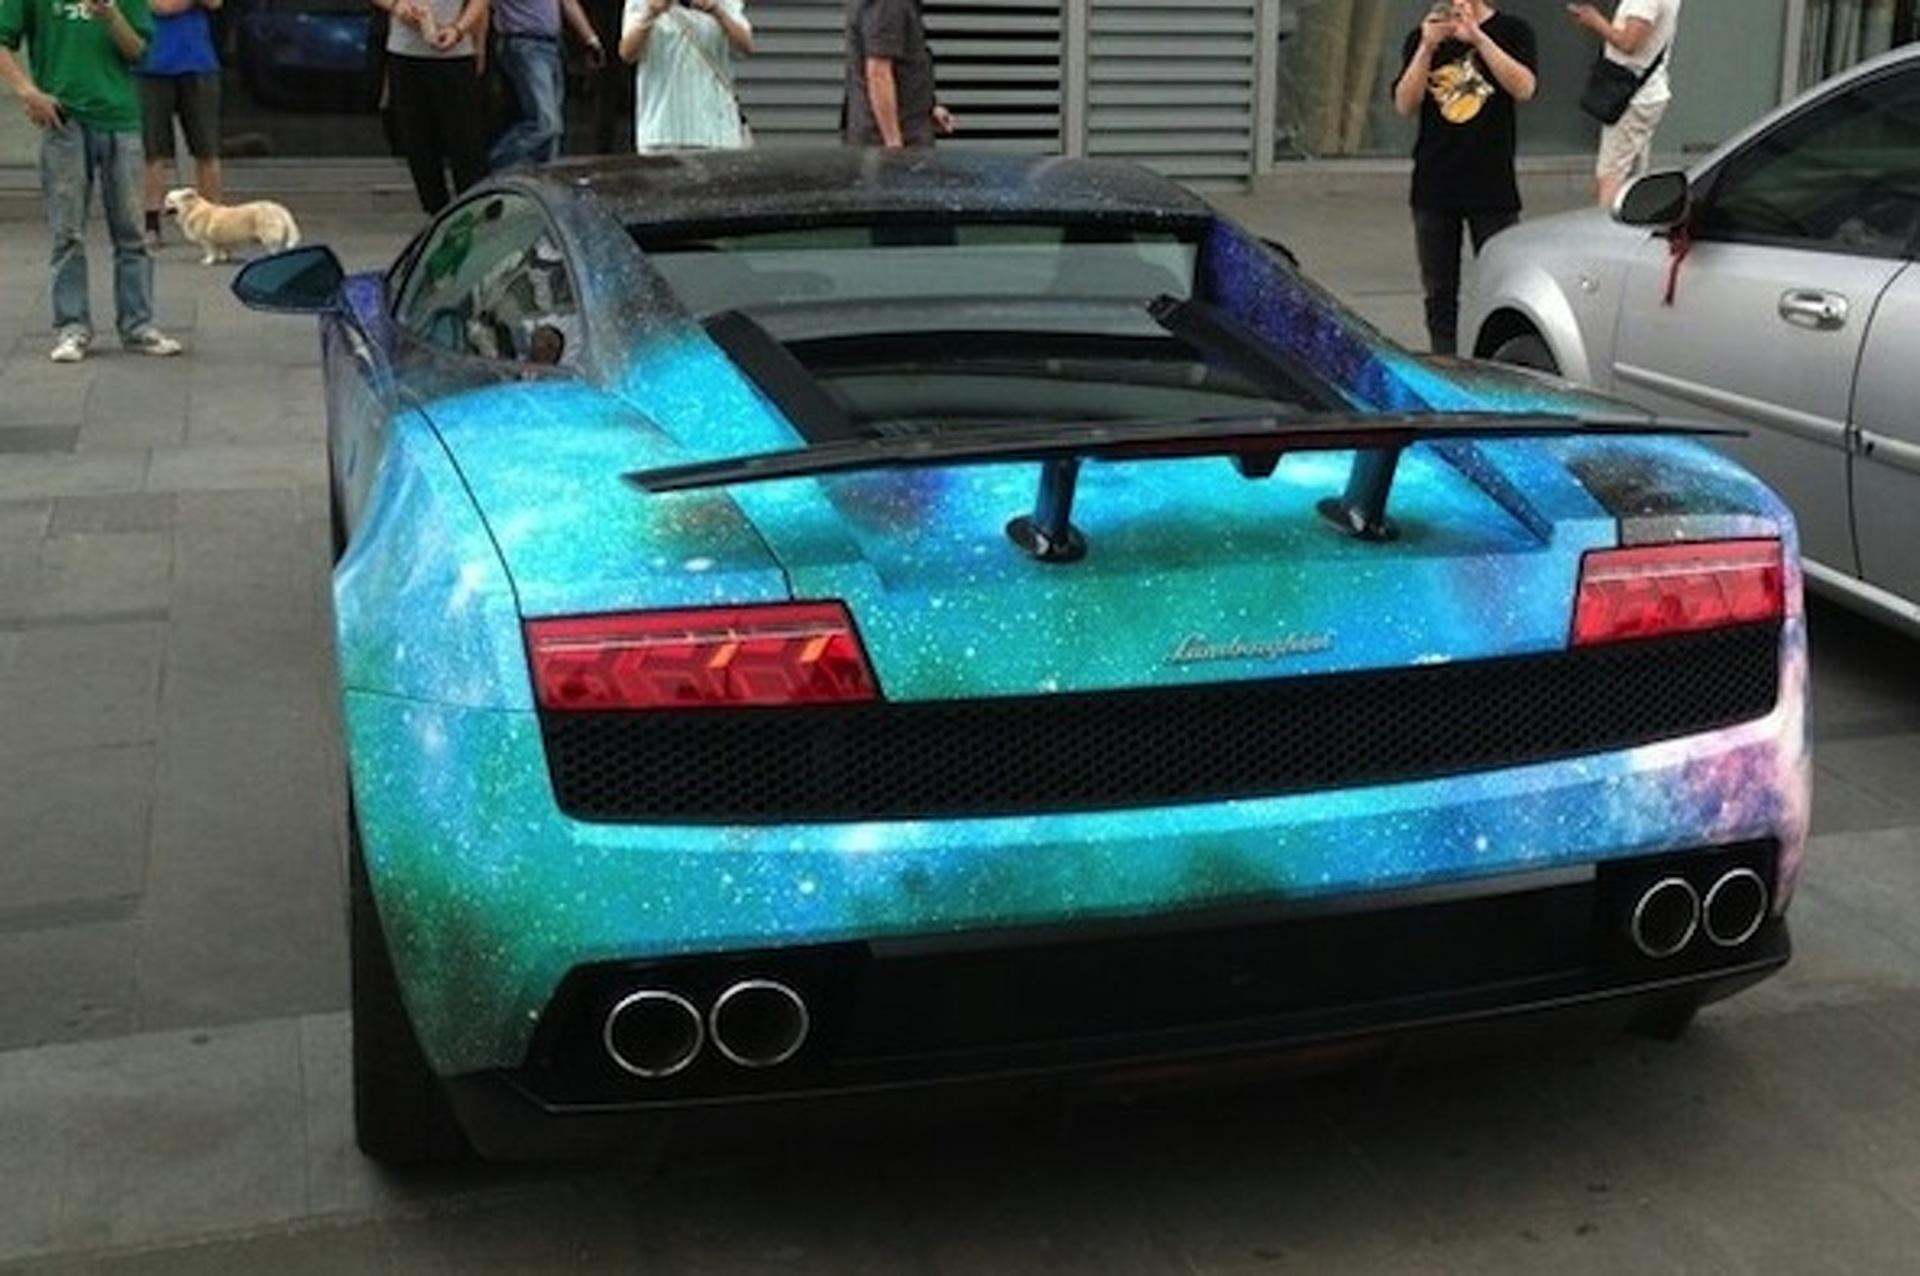 This Lamborghini Gallardo is Out of this World